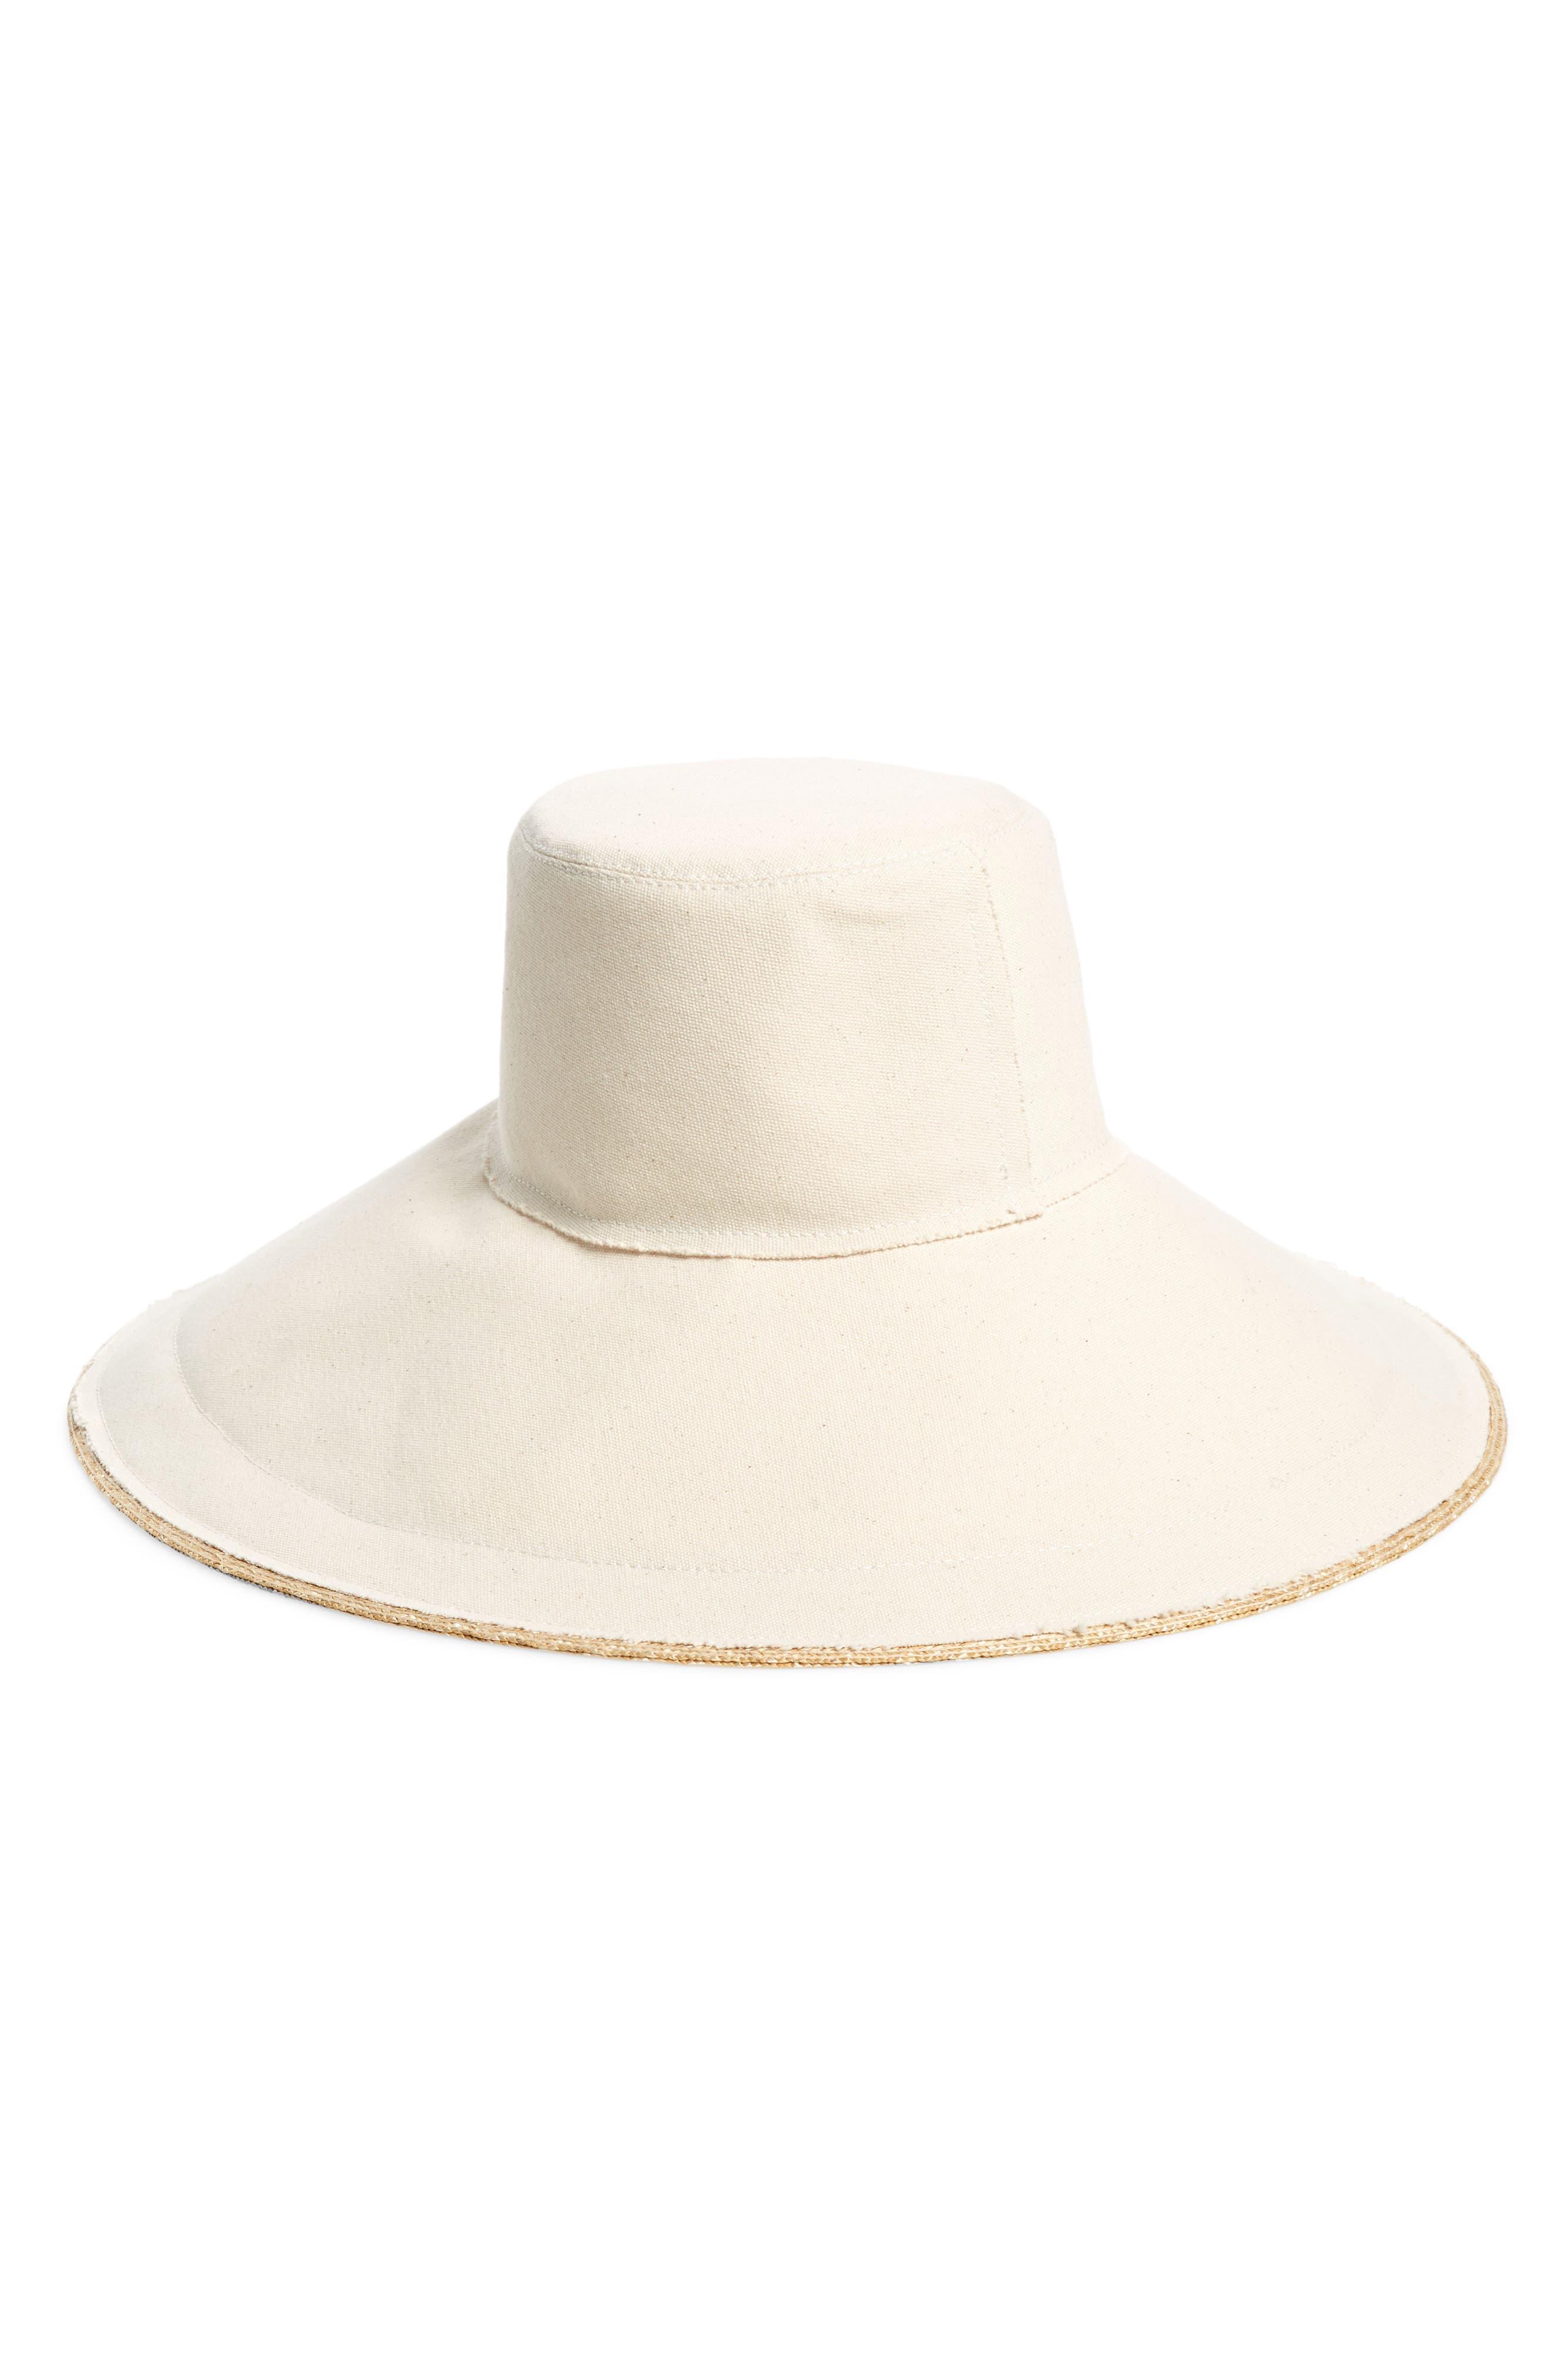 LOLA HATS Single Take Wide Brim Hat, Main, color, NATURAL